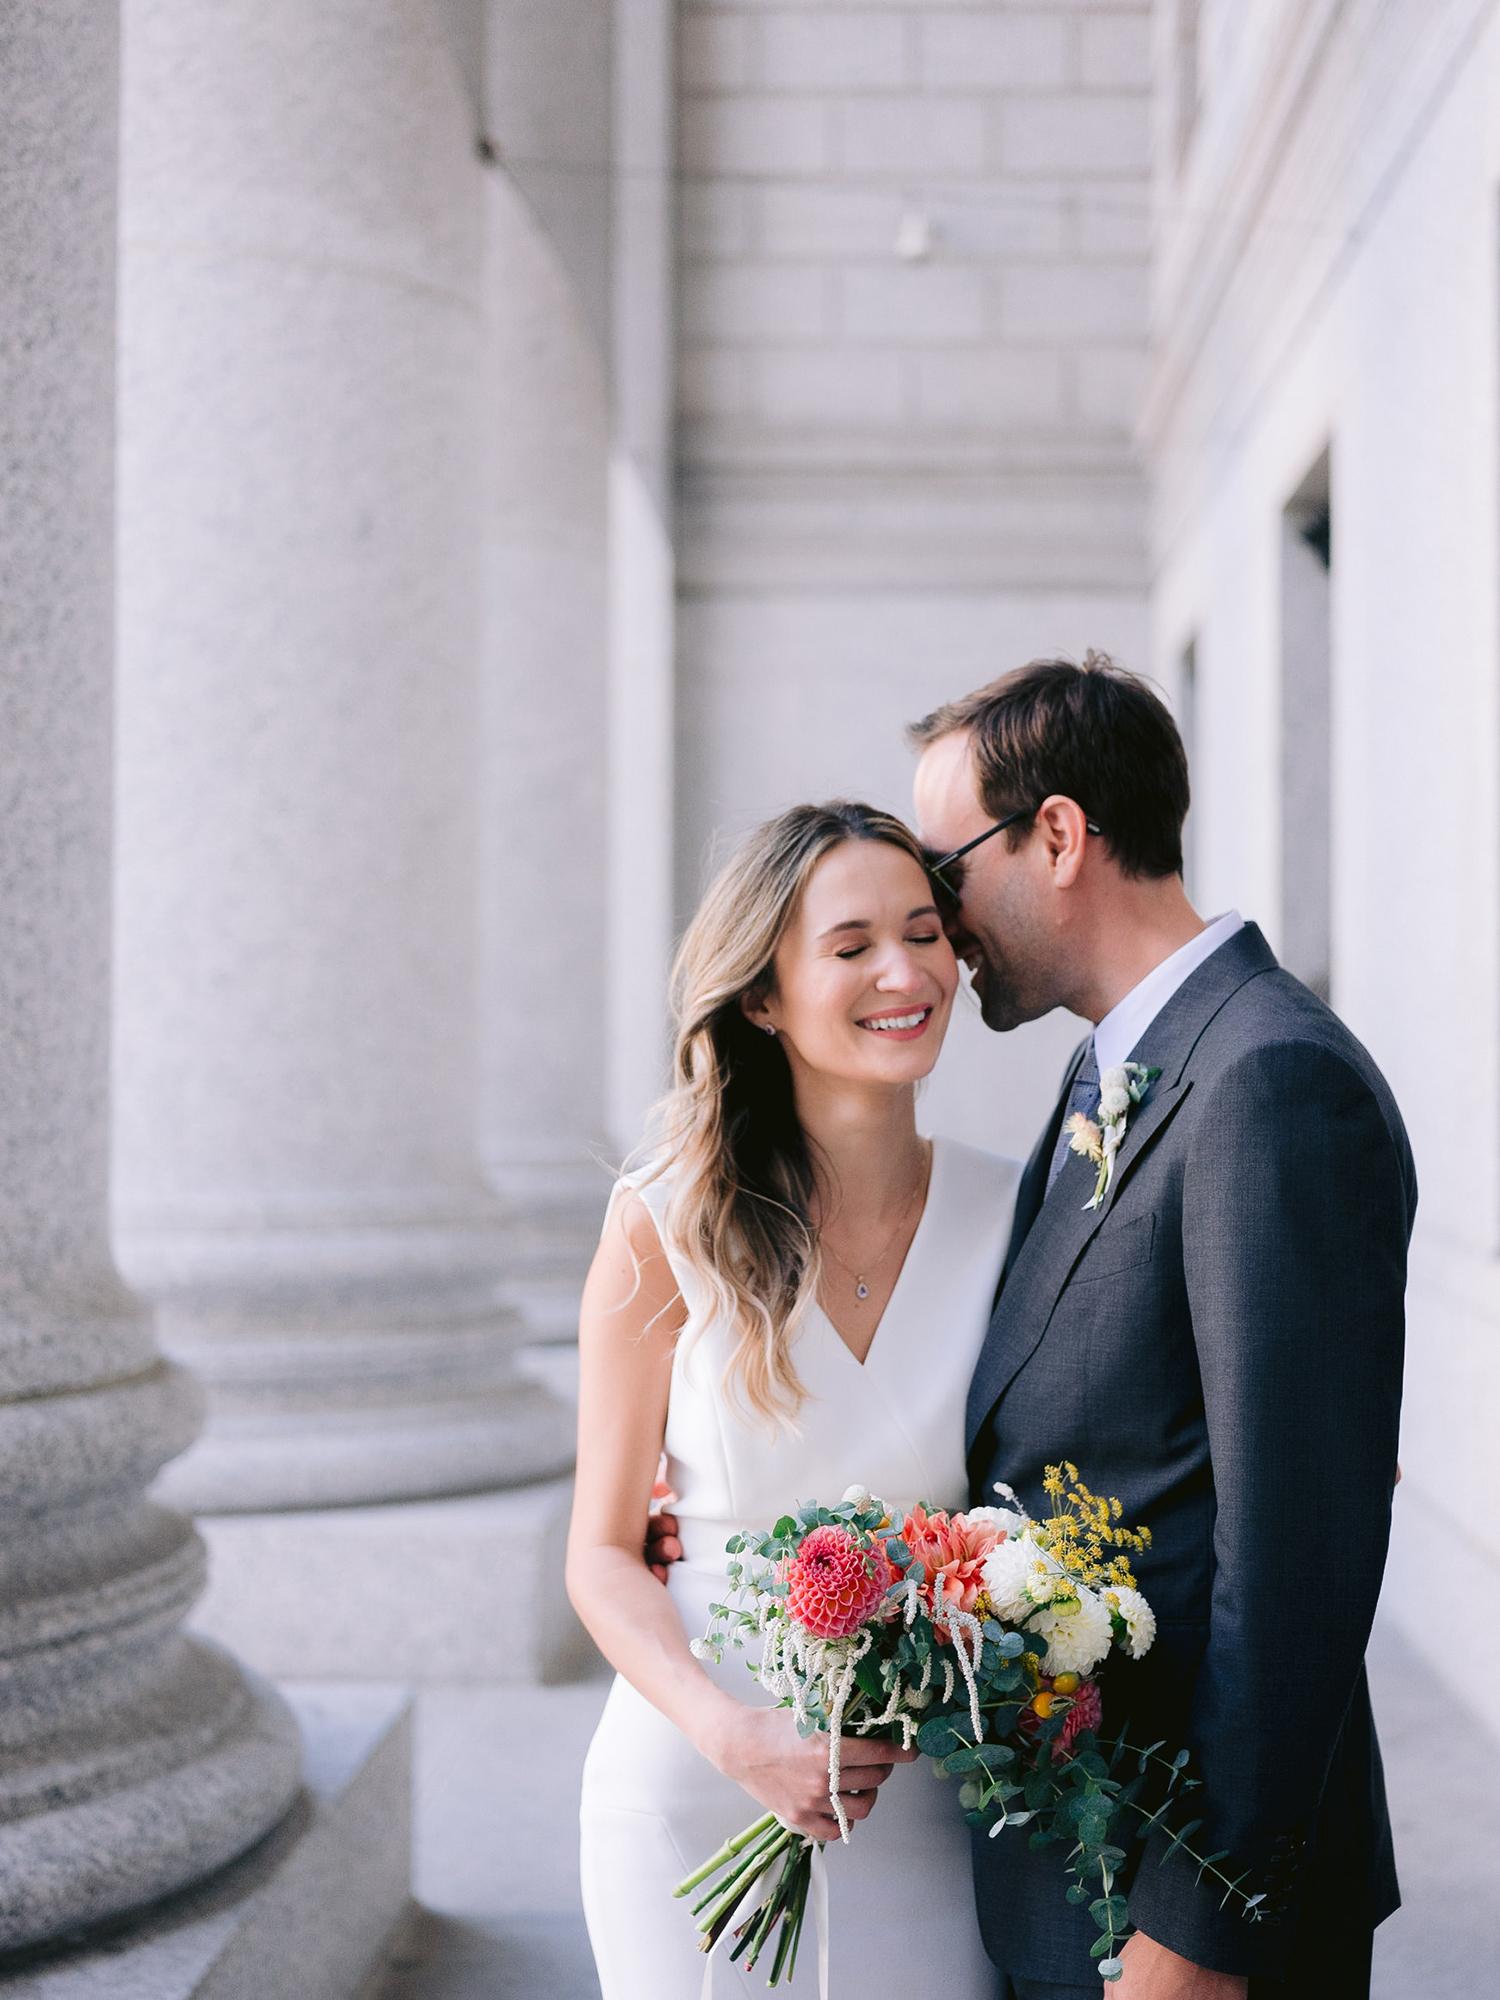 City-Hall-Elopement-New-York-Wedding-Photographer-035